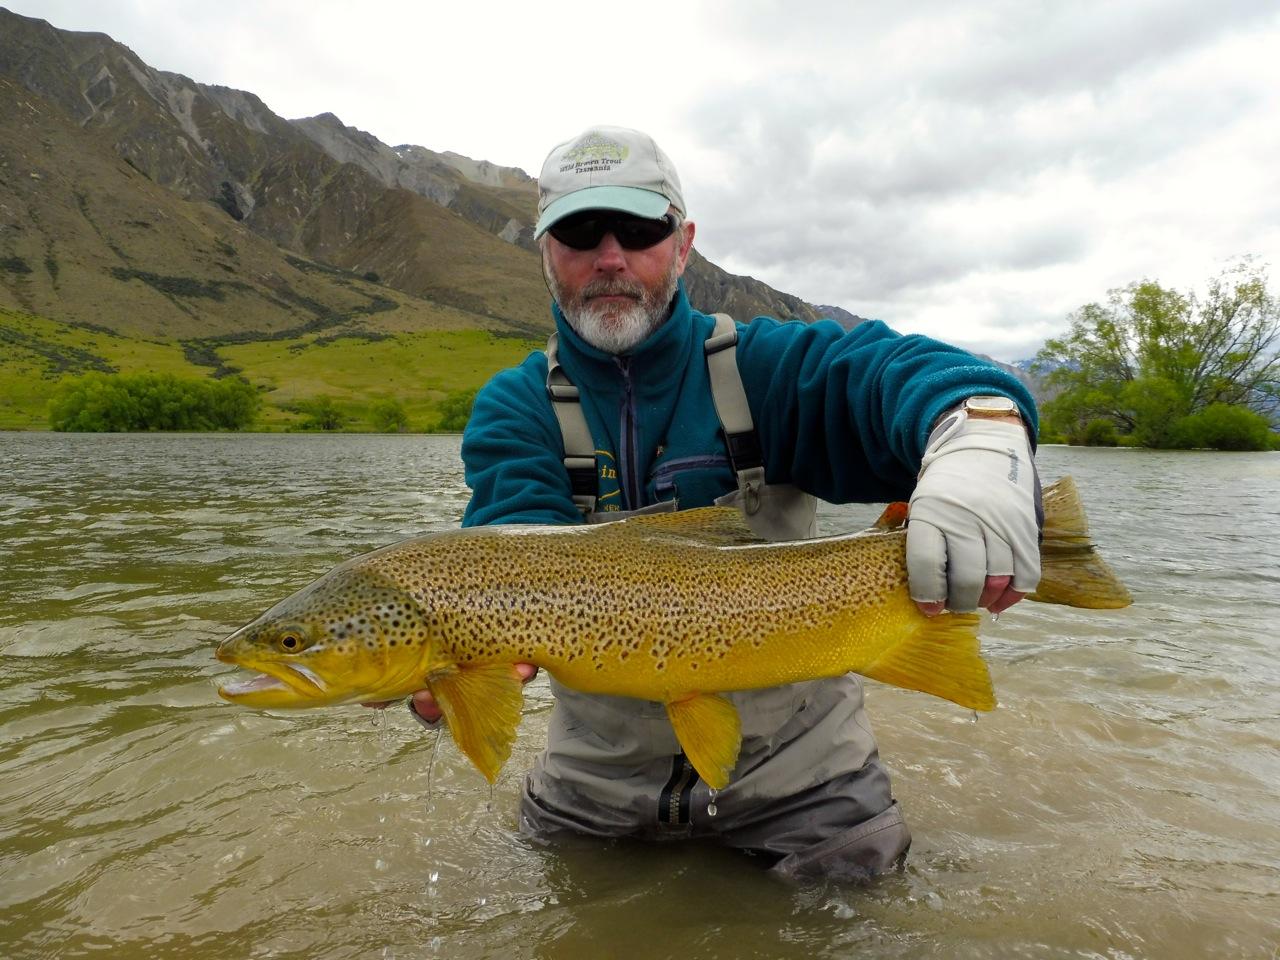 A superb fish for Joe Creane!